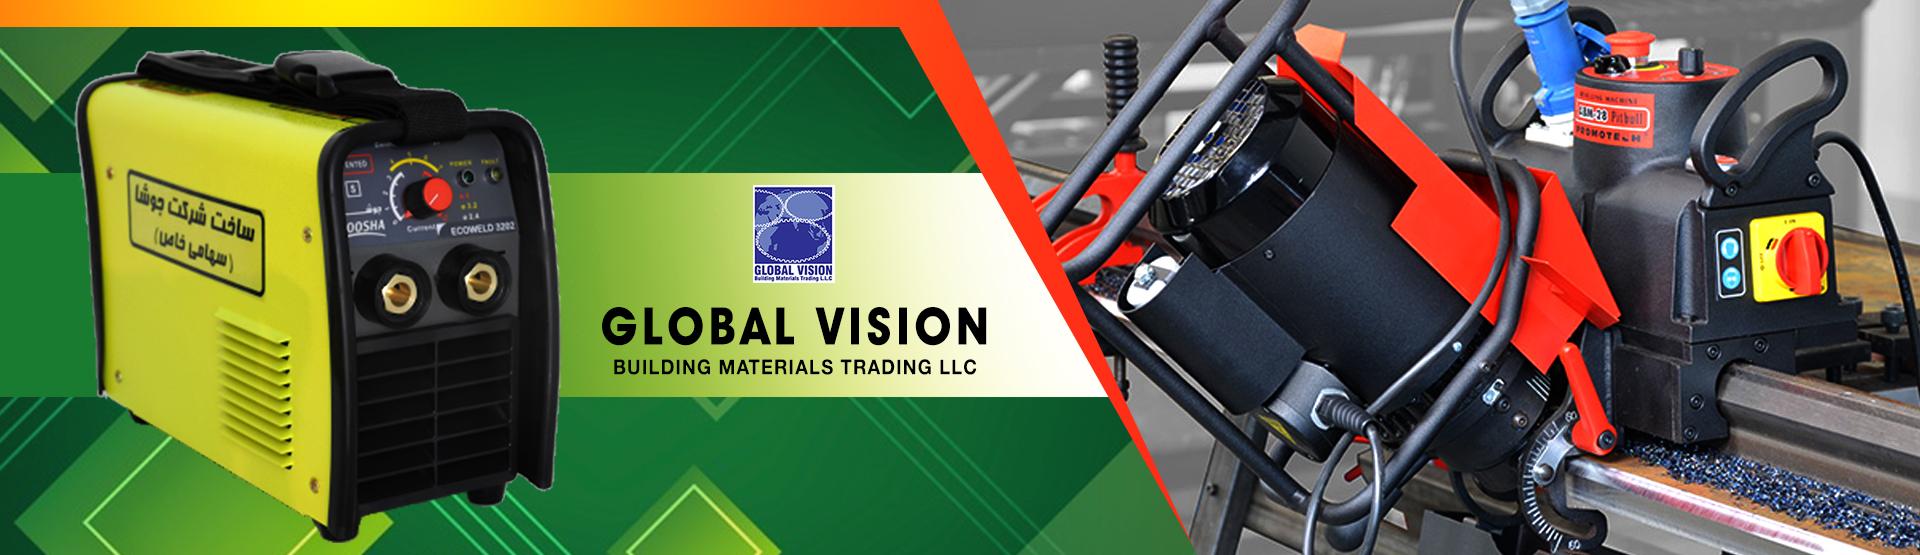 GLOBAL VISION BUILDING MATERIALS TRADING LLC